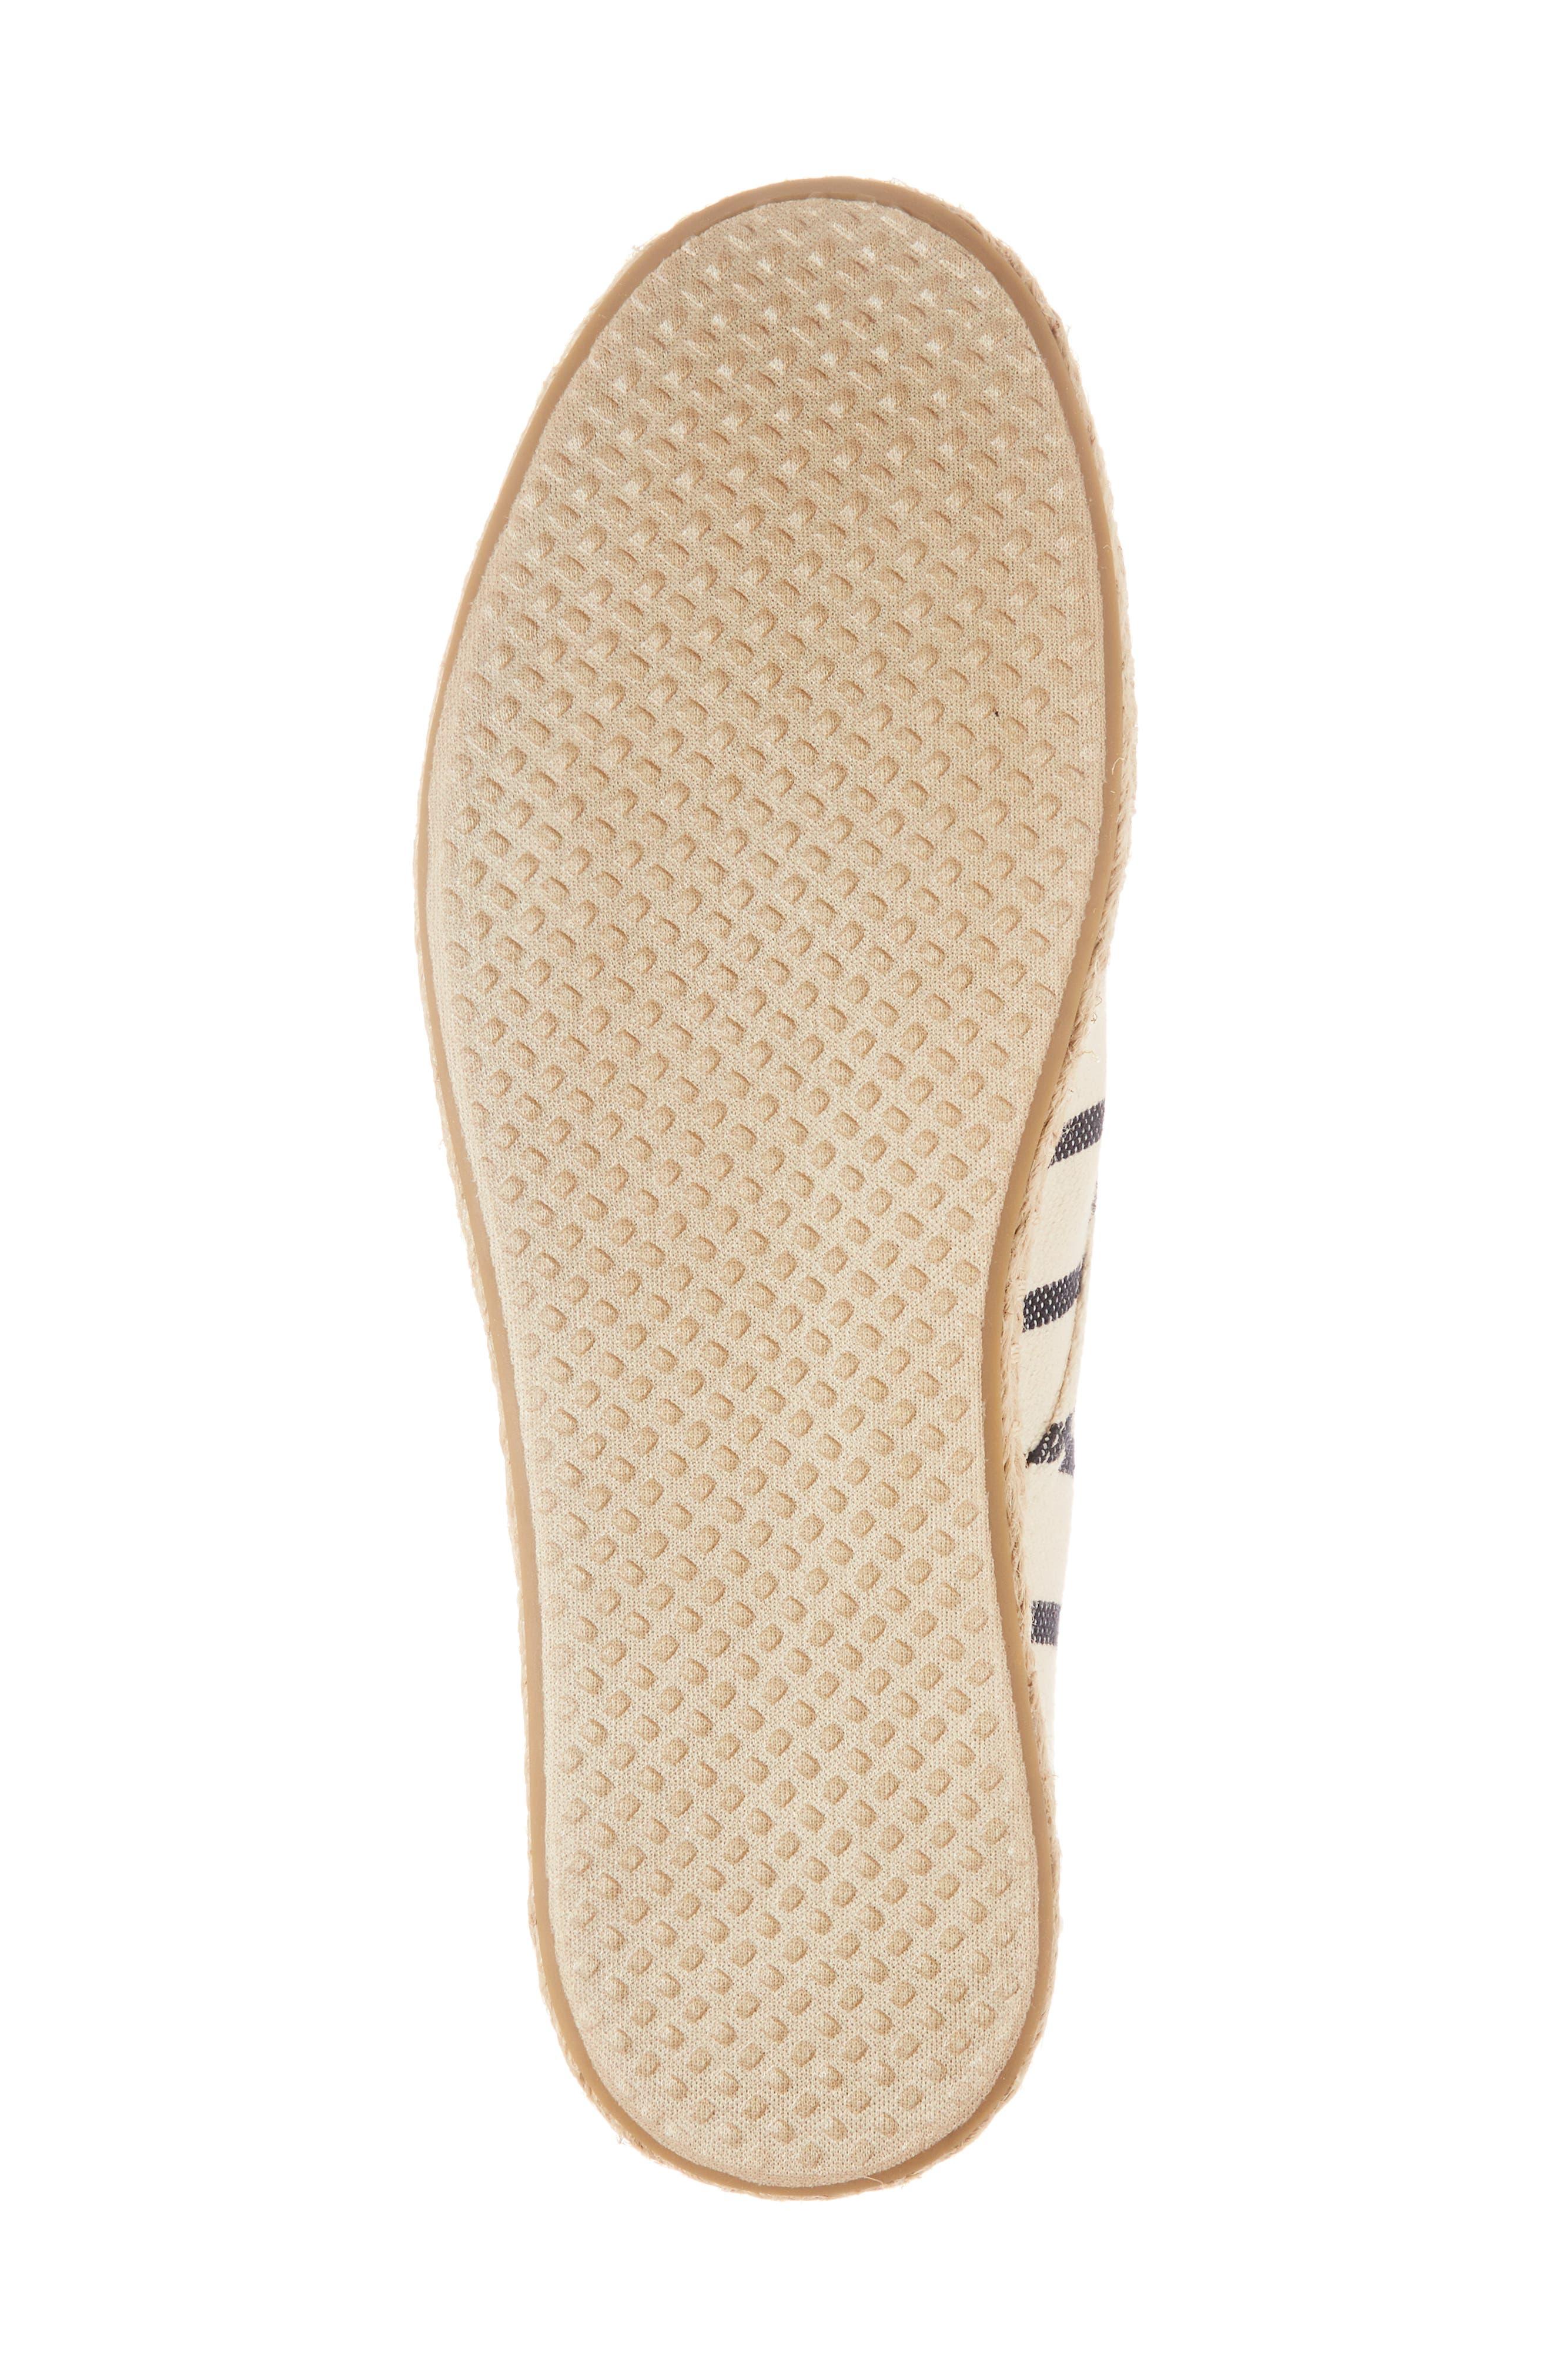 Cordones Sneaker,                             Alternate thumbnail 6, color,                             Natural Stripe Woven